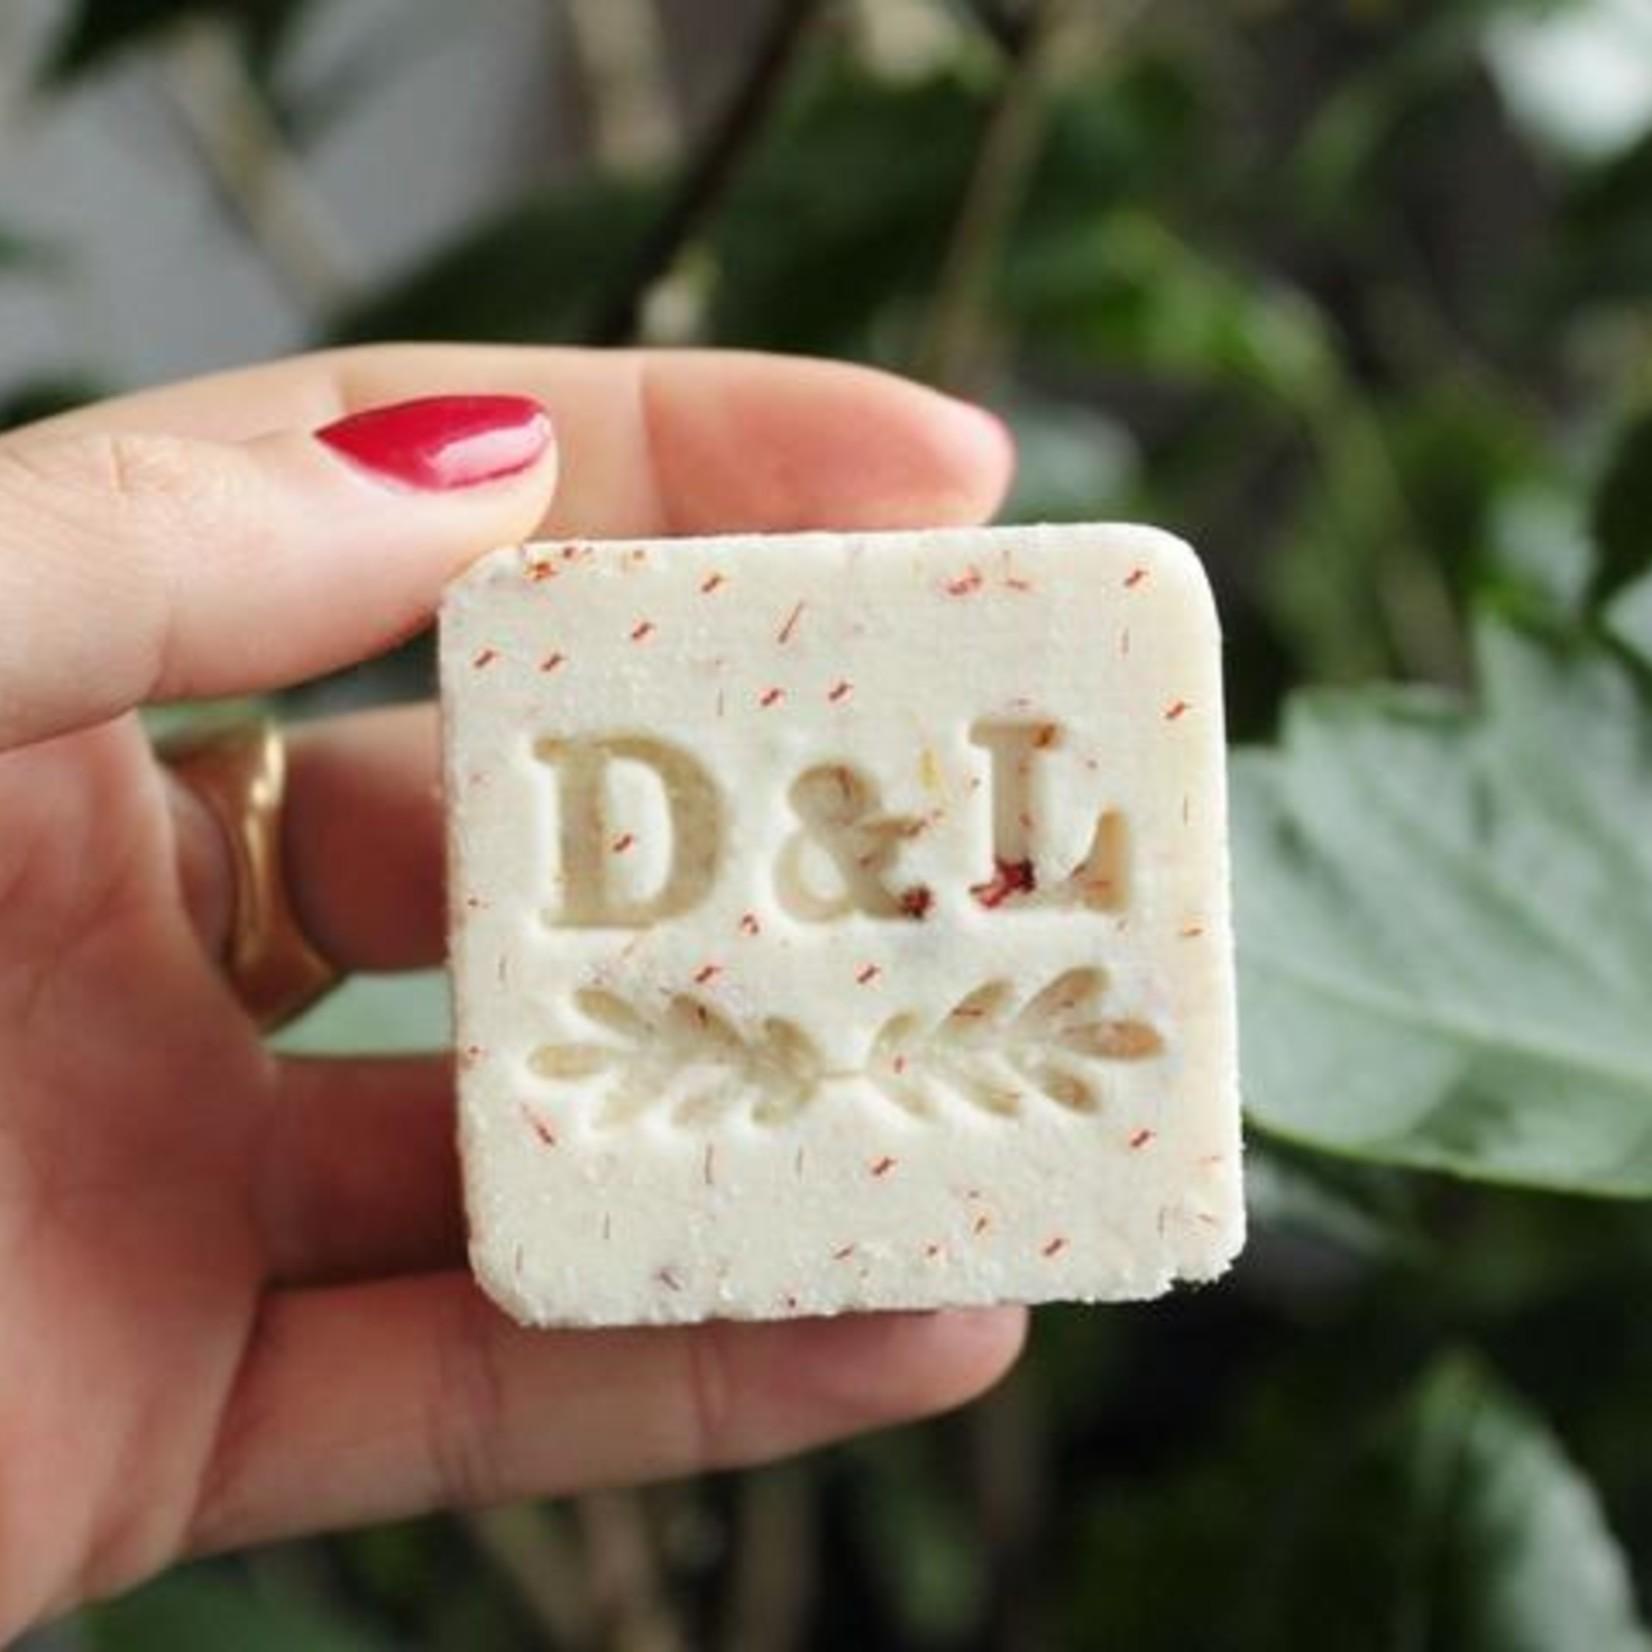 Dot & Lil Sparkling Milk Bath Cube